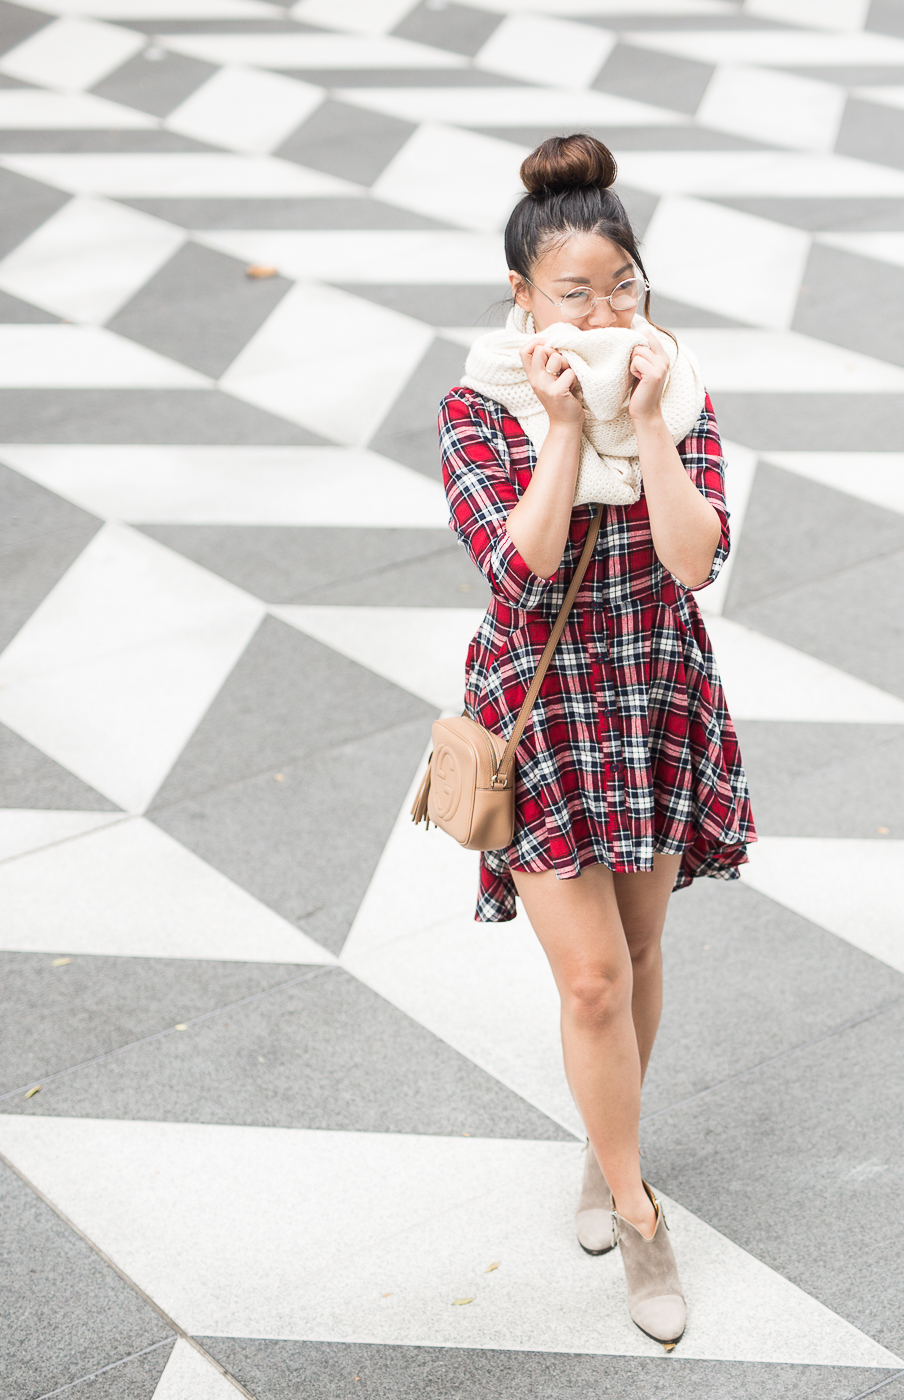 Cuyana baby alpaca infinity scarf | The Chic Diary